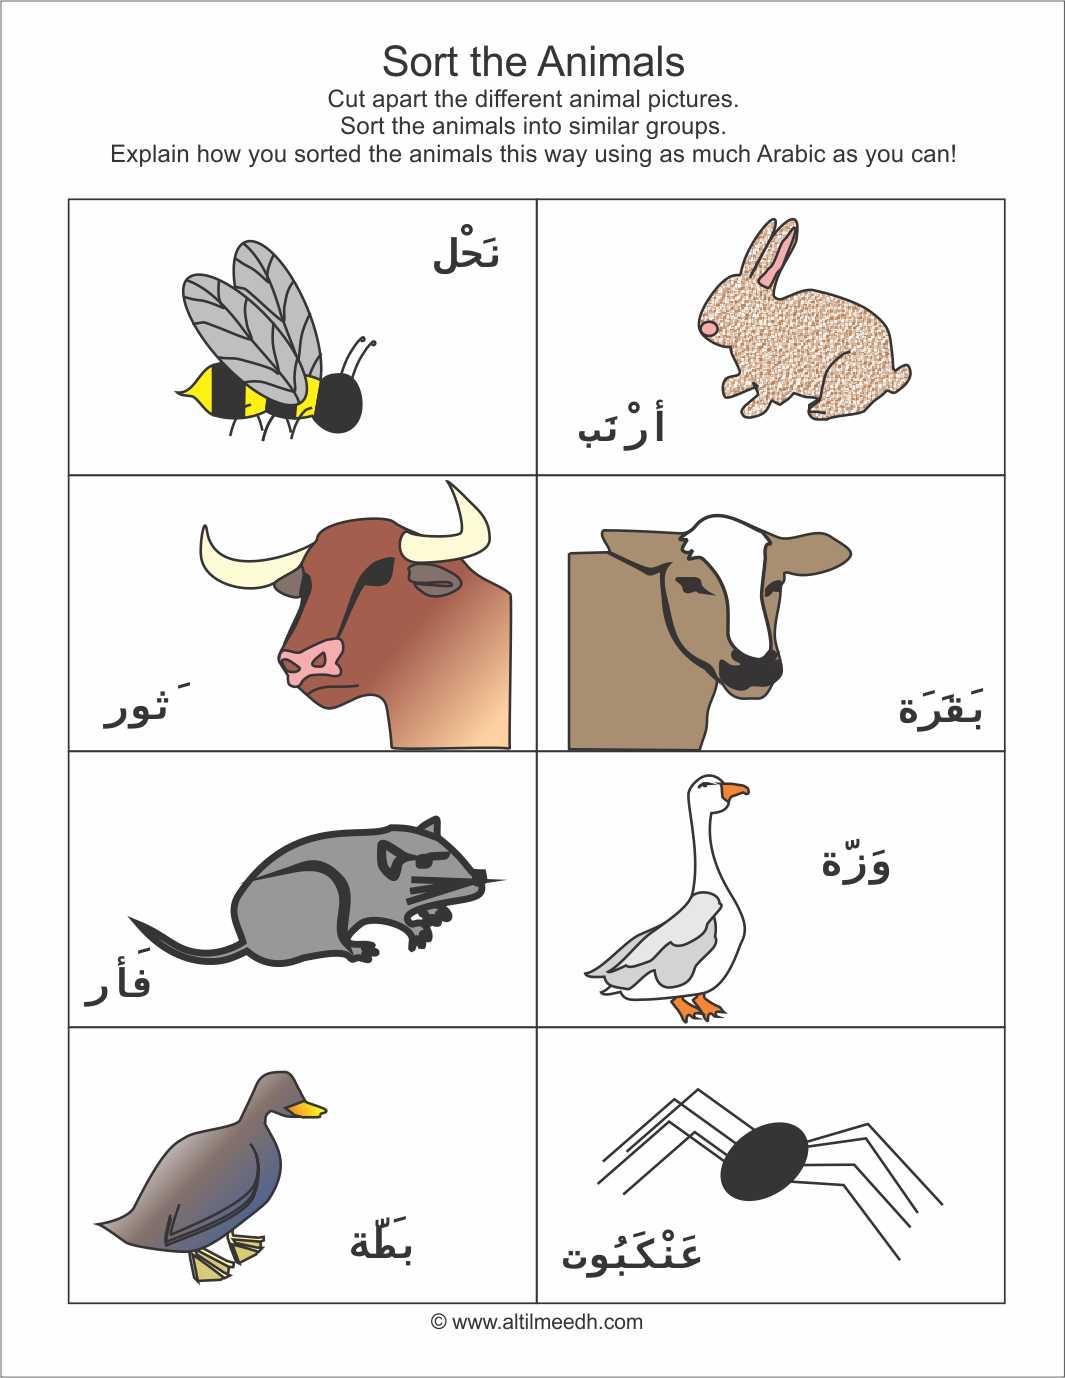 Farm Animals Sorting Cards Set